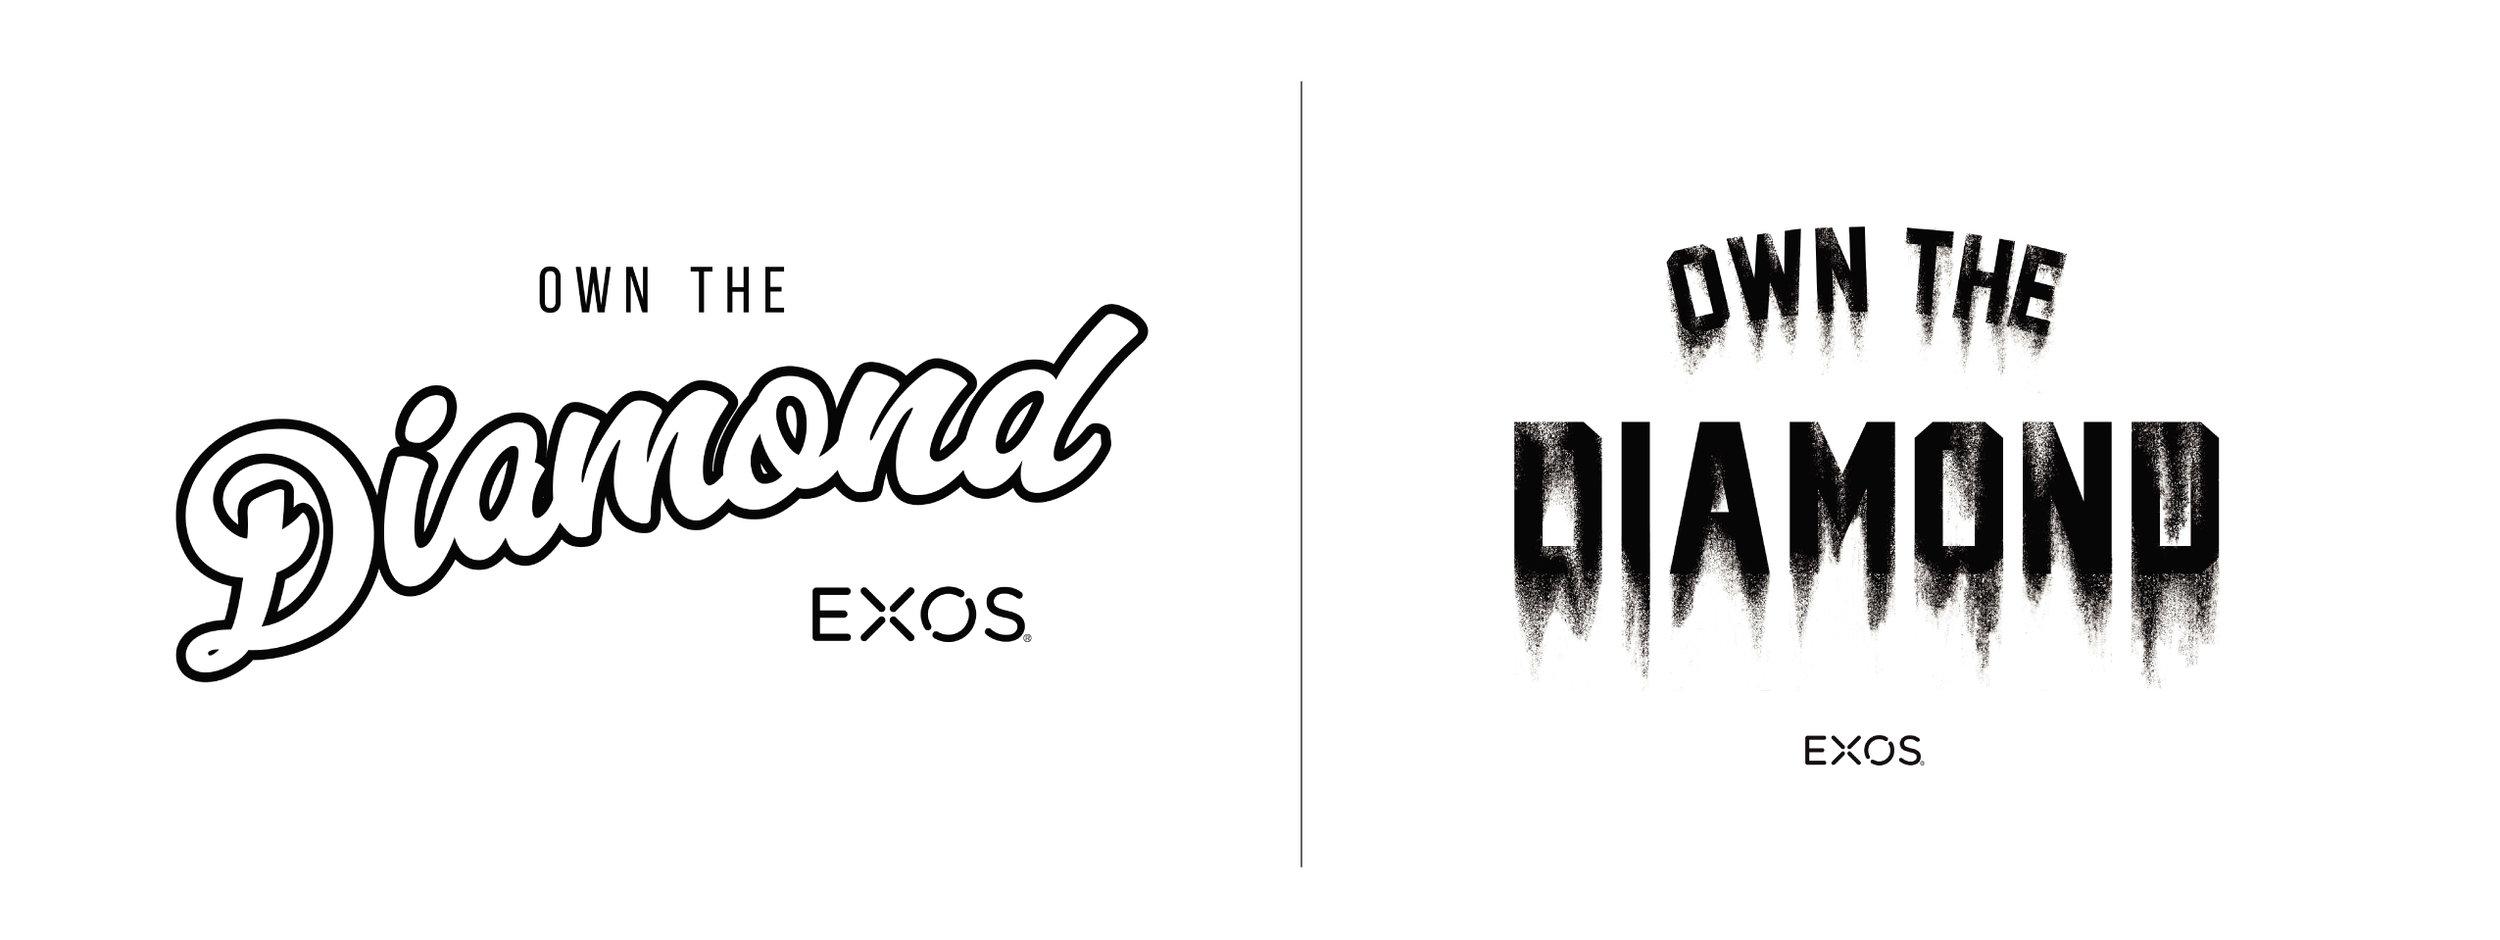 Exos_Baseball_ShirtDesigns1-12.jpg